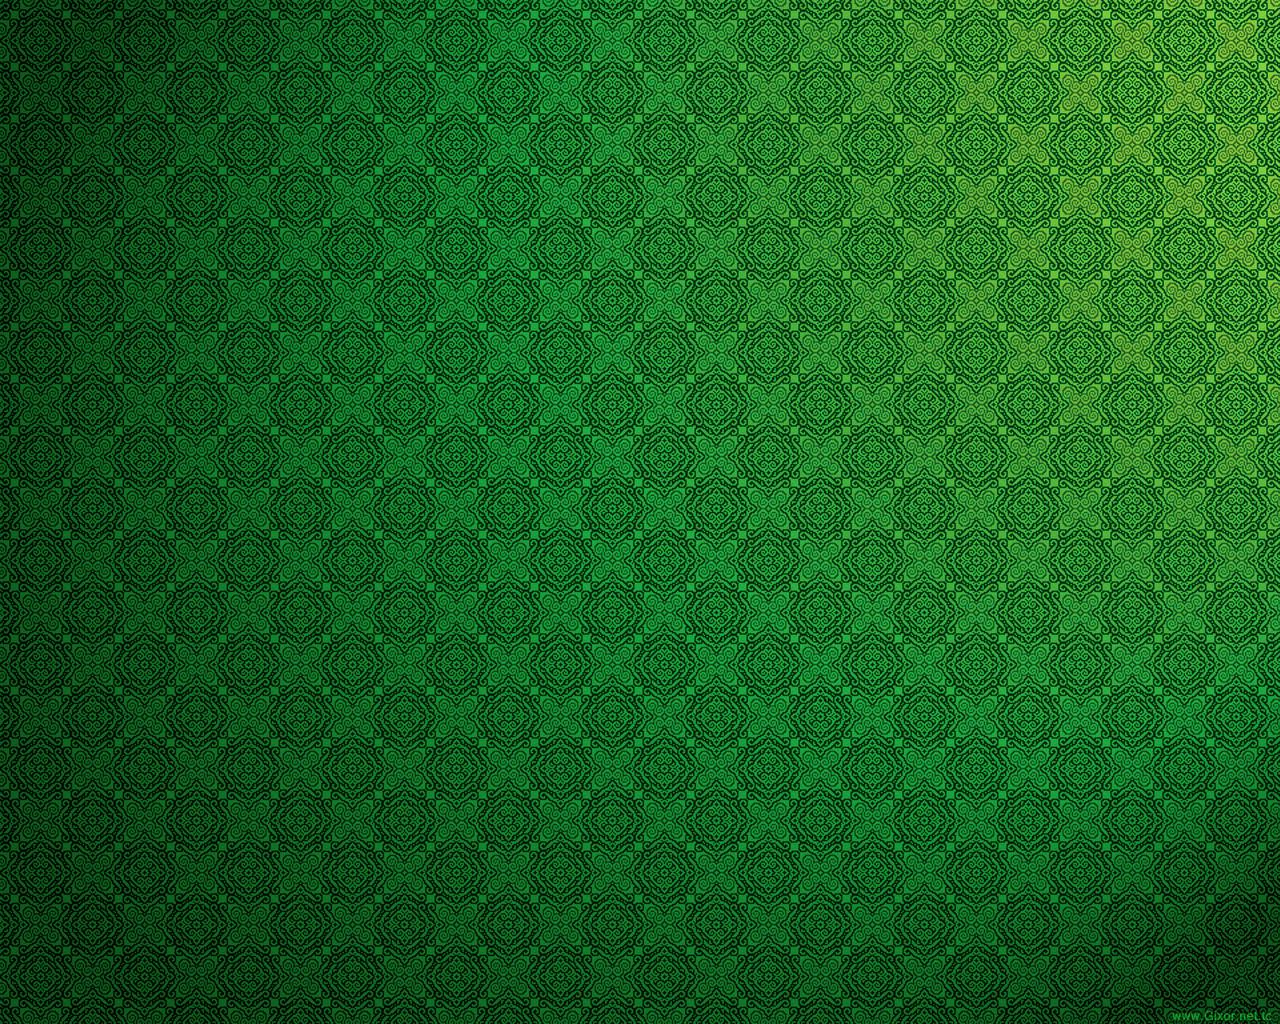 Dark Green Wallpaper Hd: Dark Green Wallpaper HD